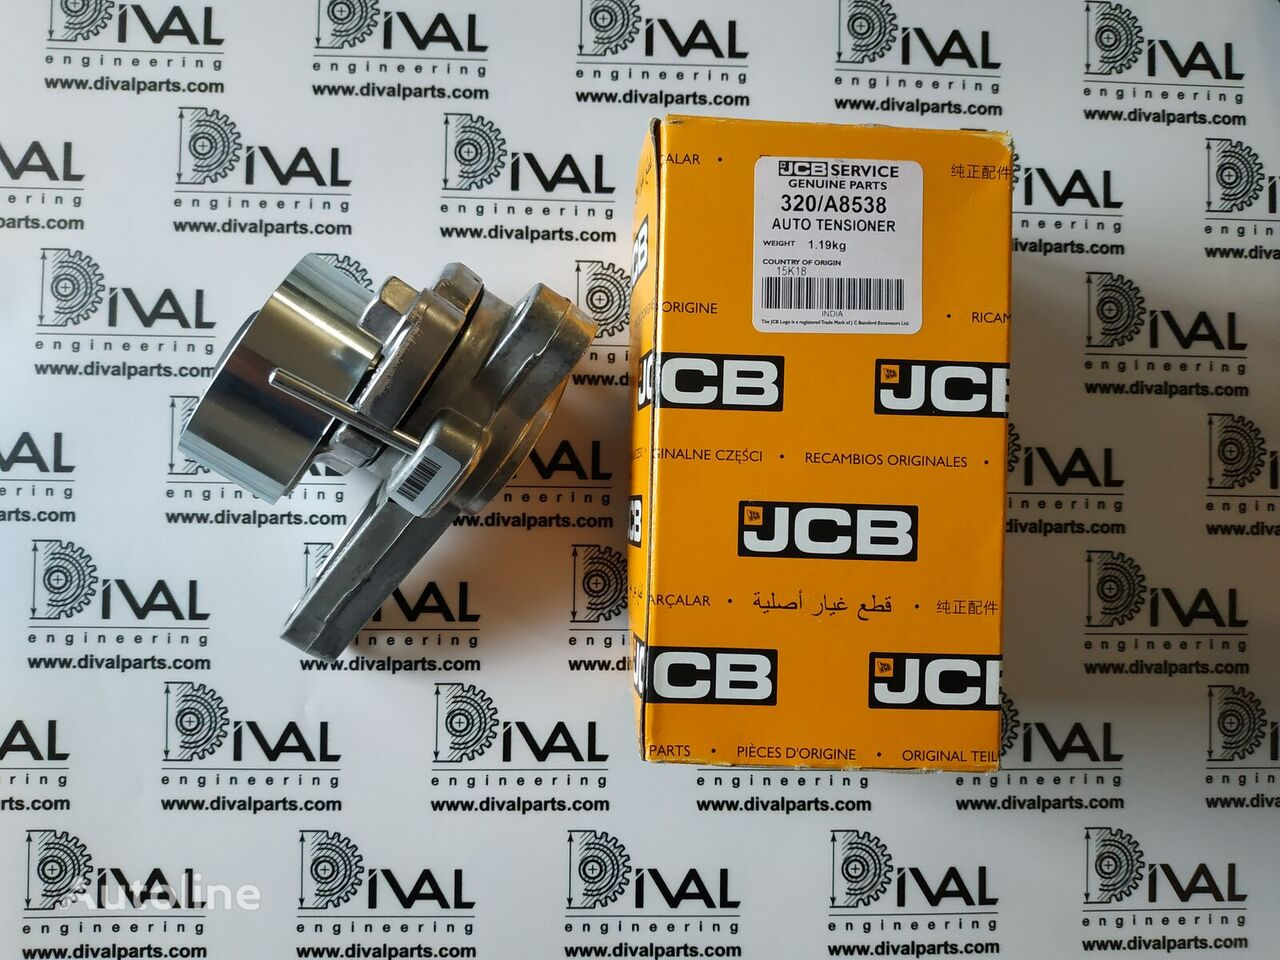 Natyazhnoy rolik JCB recambios para JCB 530/70, 531/70, 540/70, 541/70, 535/95, 533/105, 535/125, 535/125 HiViz, 535/140, 540/140, 3CX, 4CX, 5CX retroexcavadora